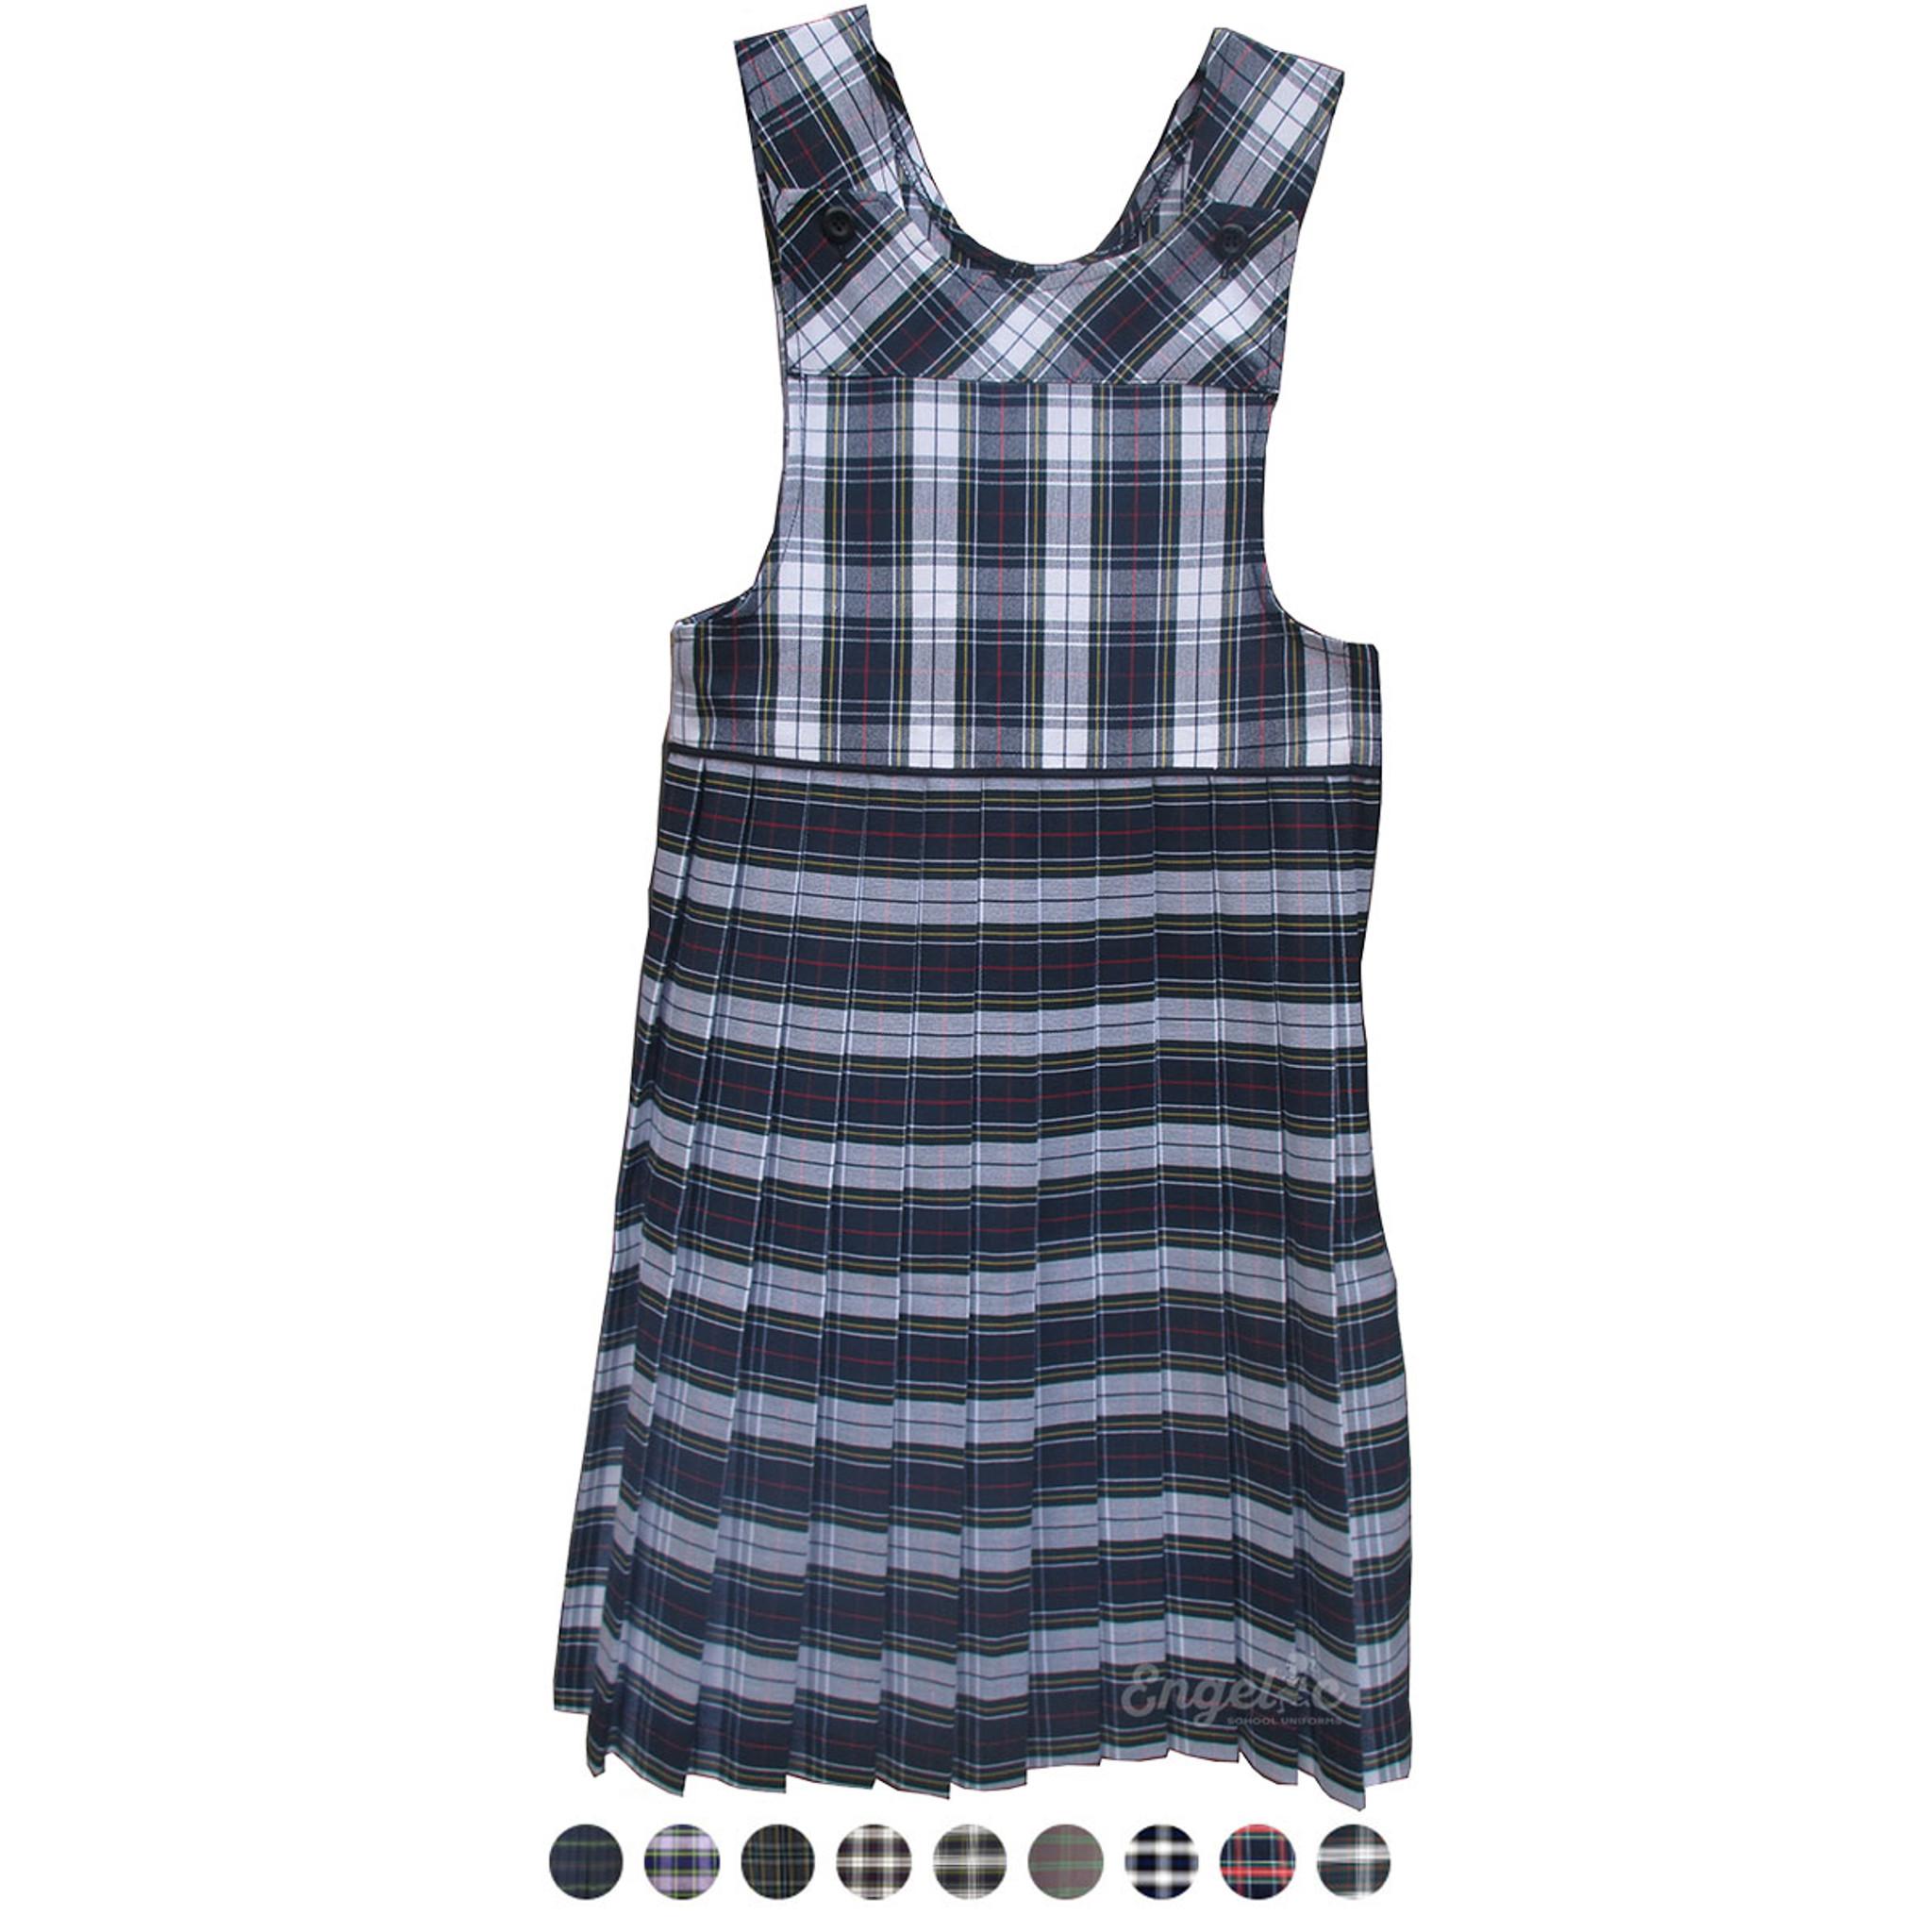 Bienzoe Girls Stretchy Pleated Durable School Uniforms Jumper